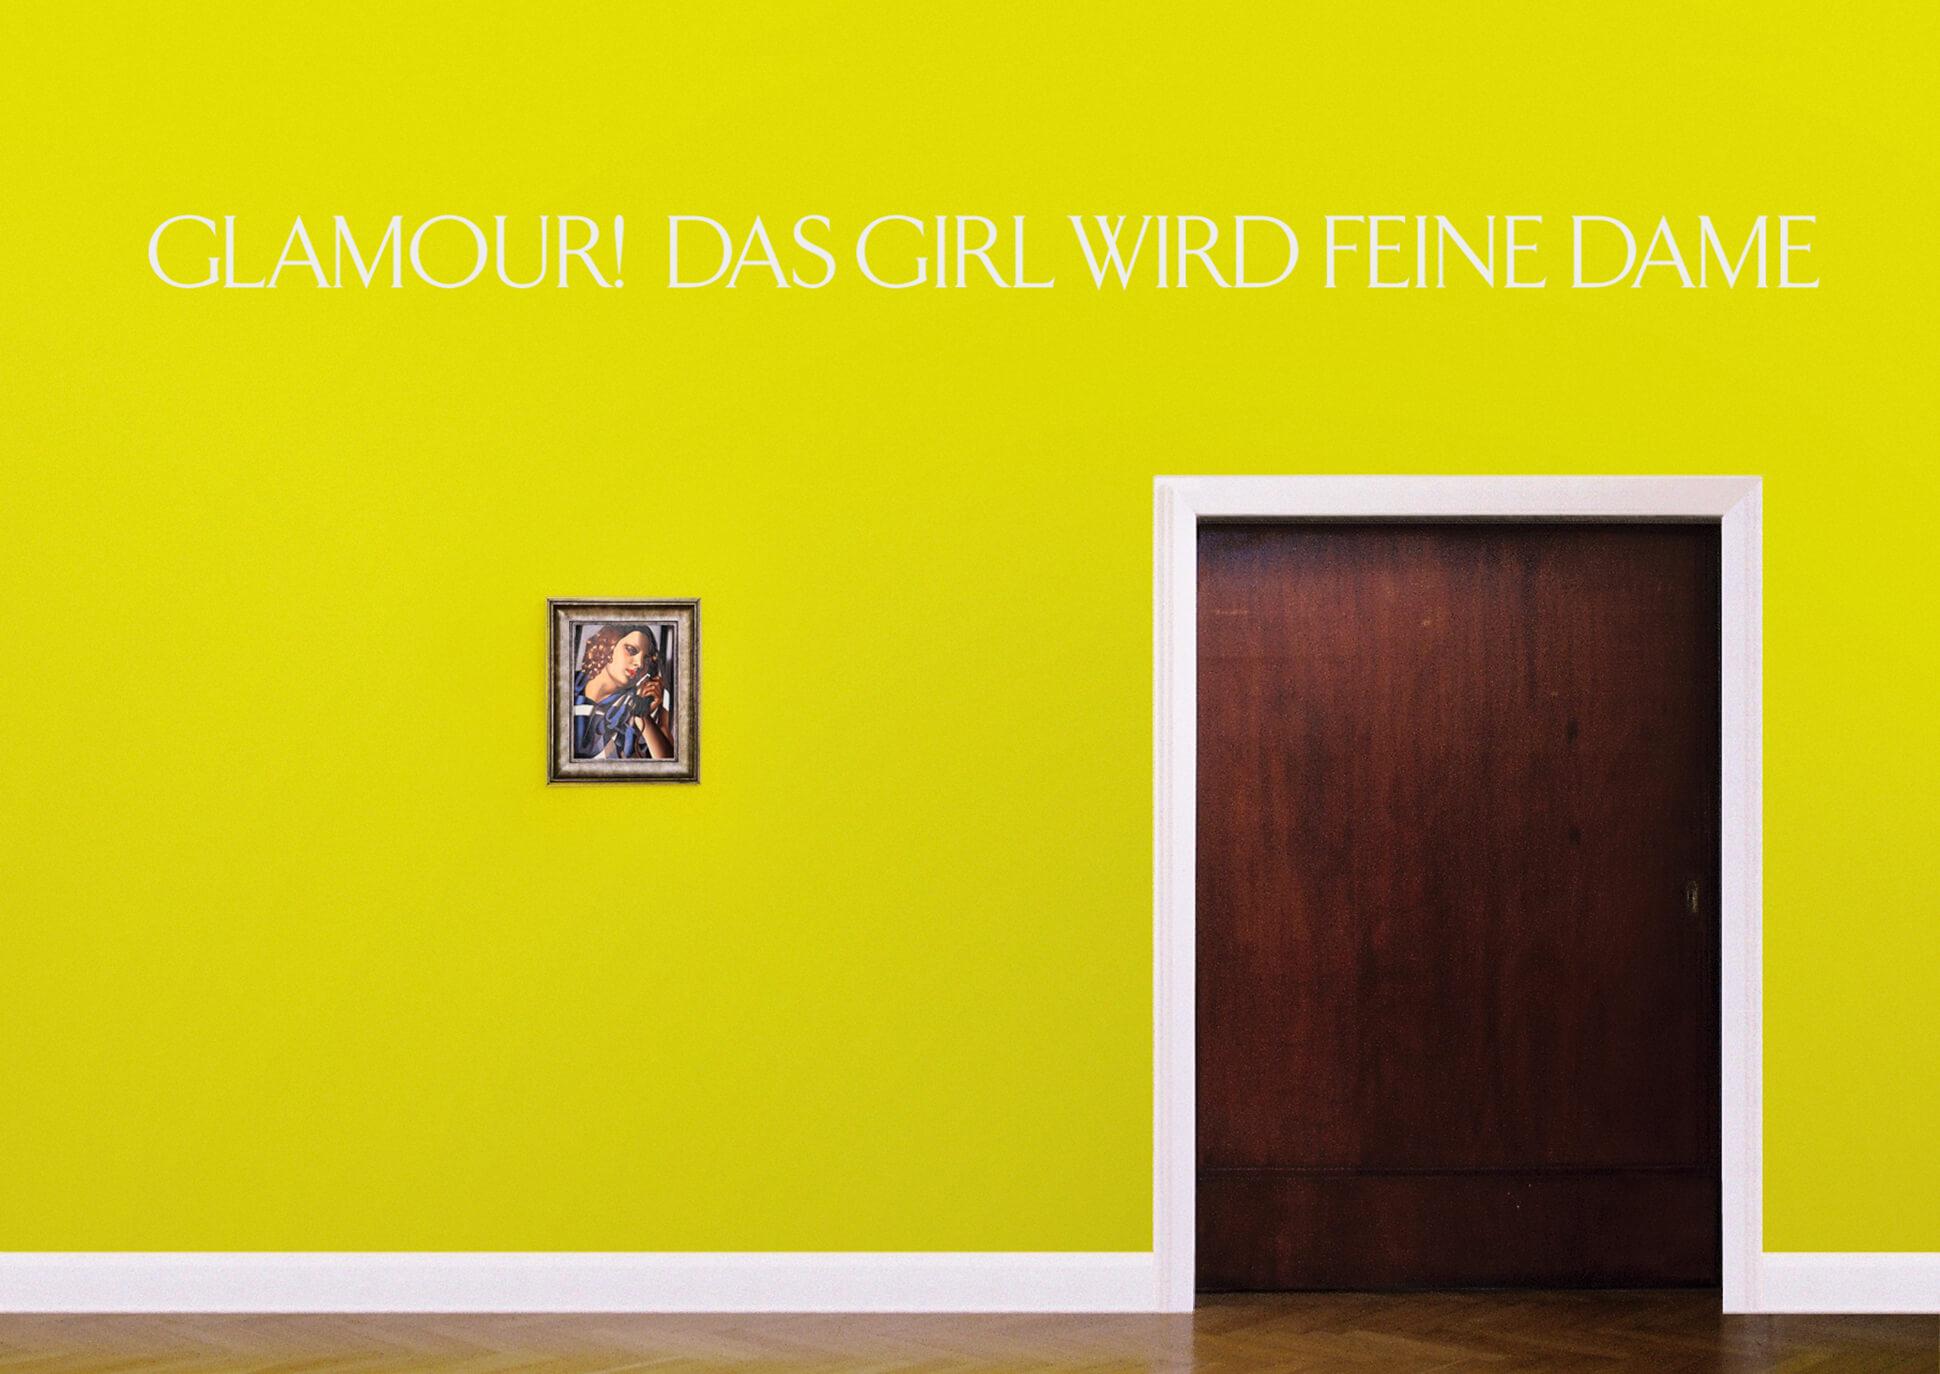 Georg_Kolbe_Museum_Glamour_Wall